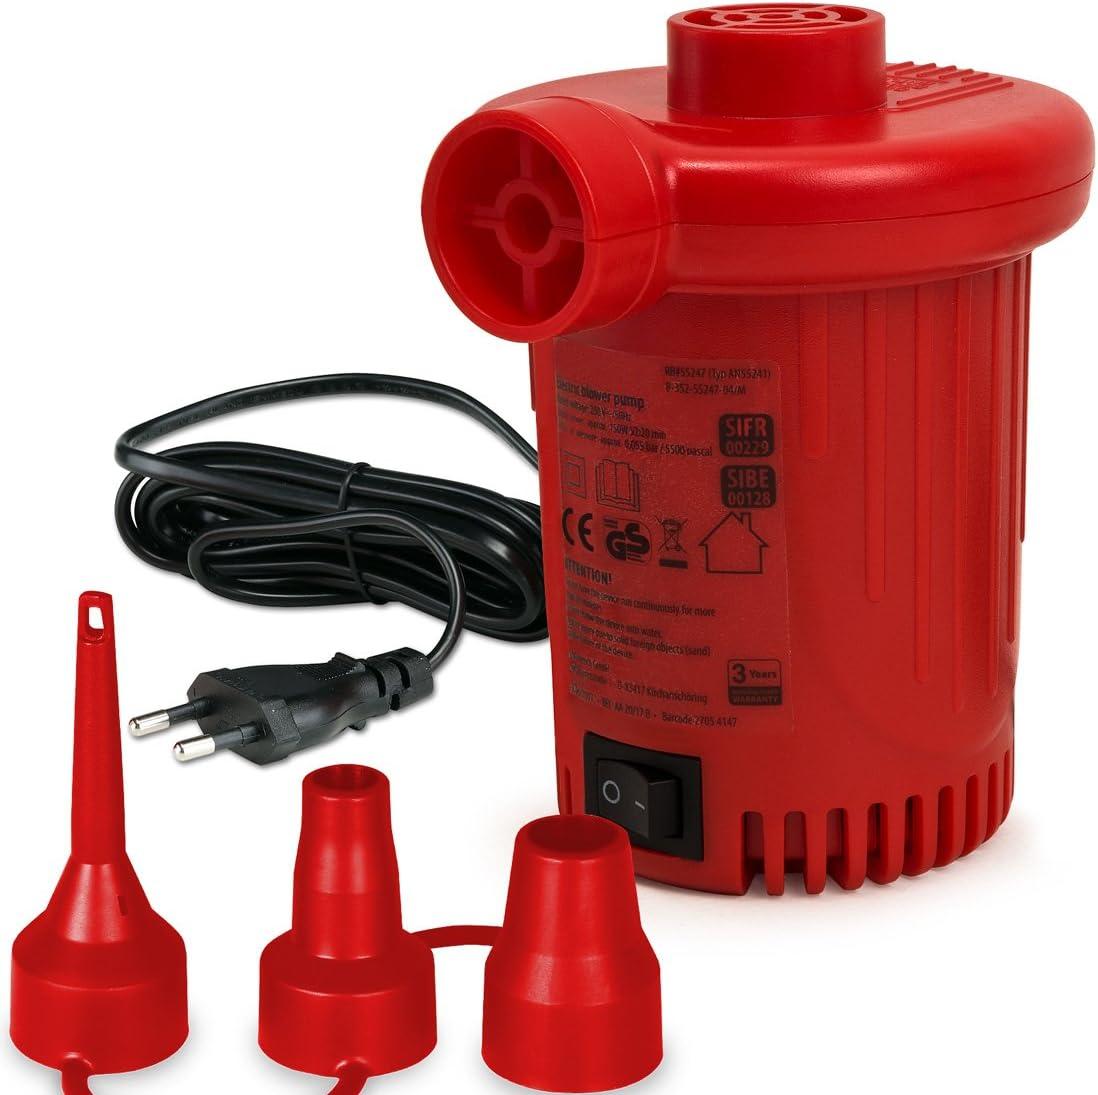 Deuba Bomba de aire el/éctrico Rojo de 230V con 3 adaptadores e interruptor hincha flotadores piscinas 550l//min